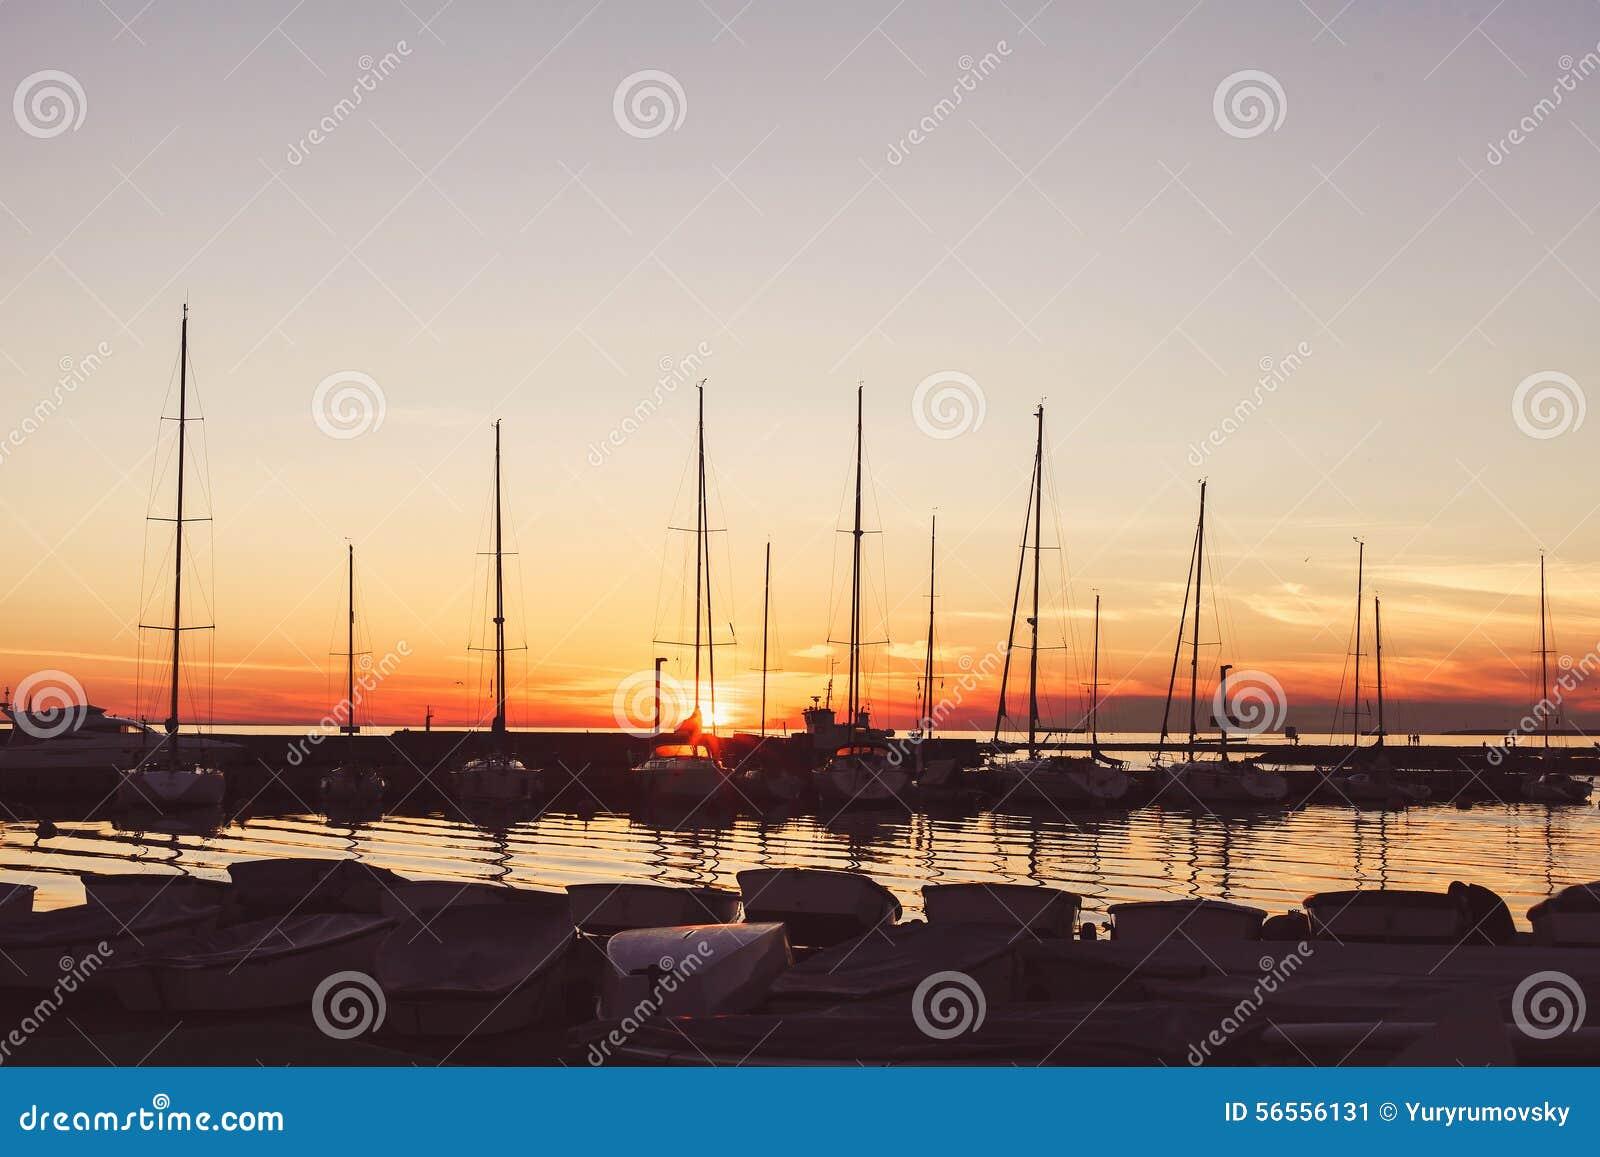 Download Λιμένας γιοτ στο ηλιοβασίλεμα Στοκ Εικόνα - εικόνα από sailboat, βακκινίων: 56556131